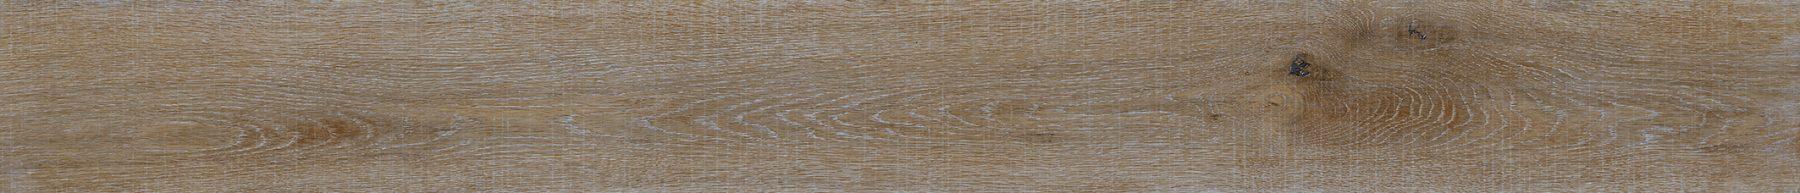 Porcelanosa Devon Roble 19.3 x 180 cm